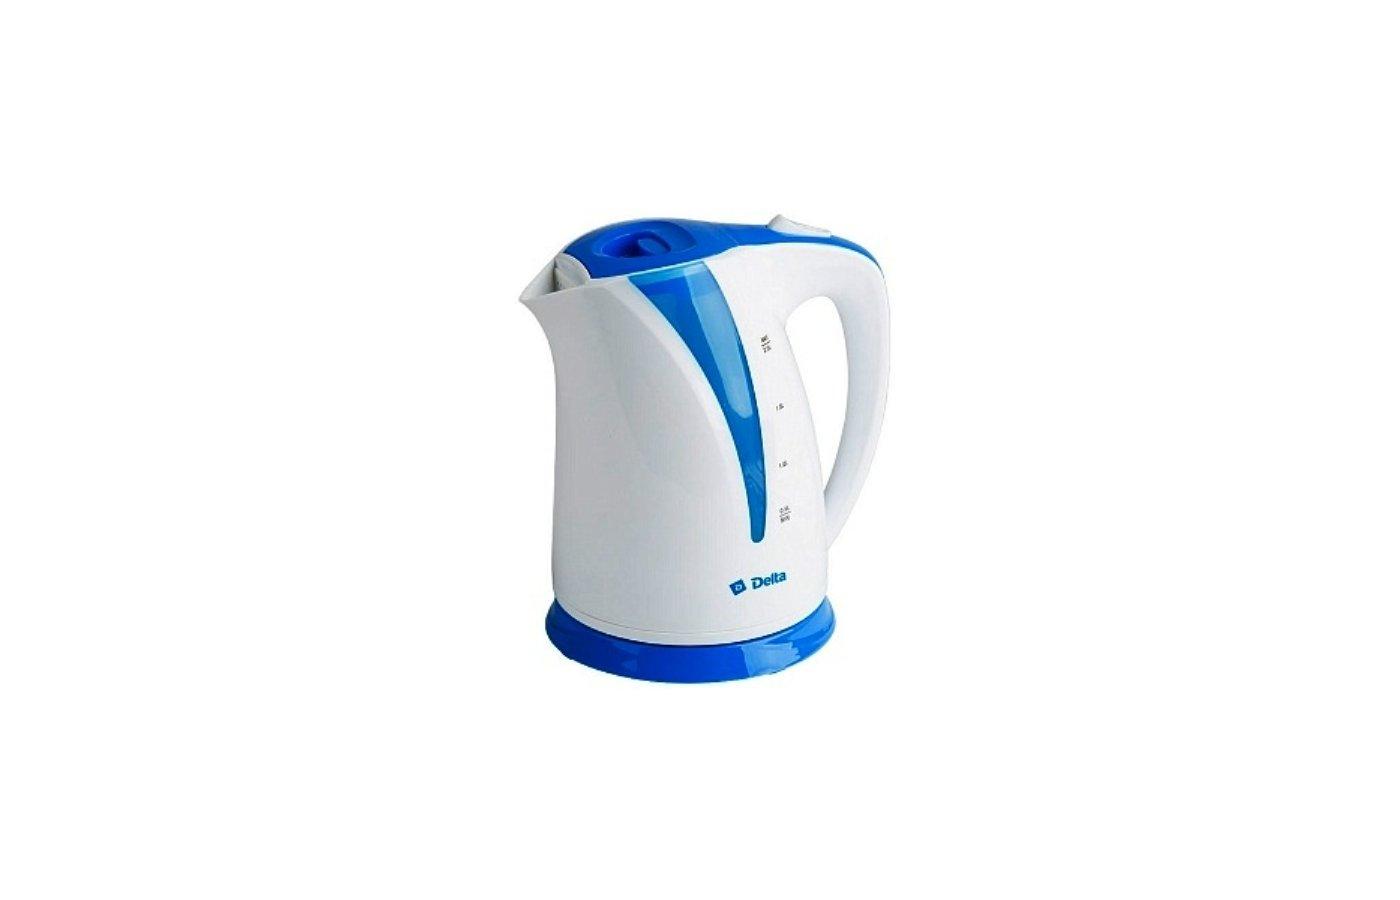 Чайник электрический  DELTA DL-1327 белый/голубой